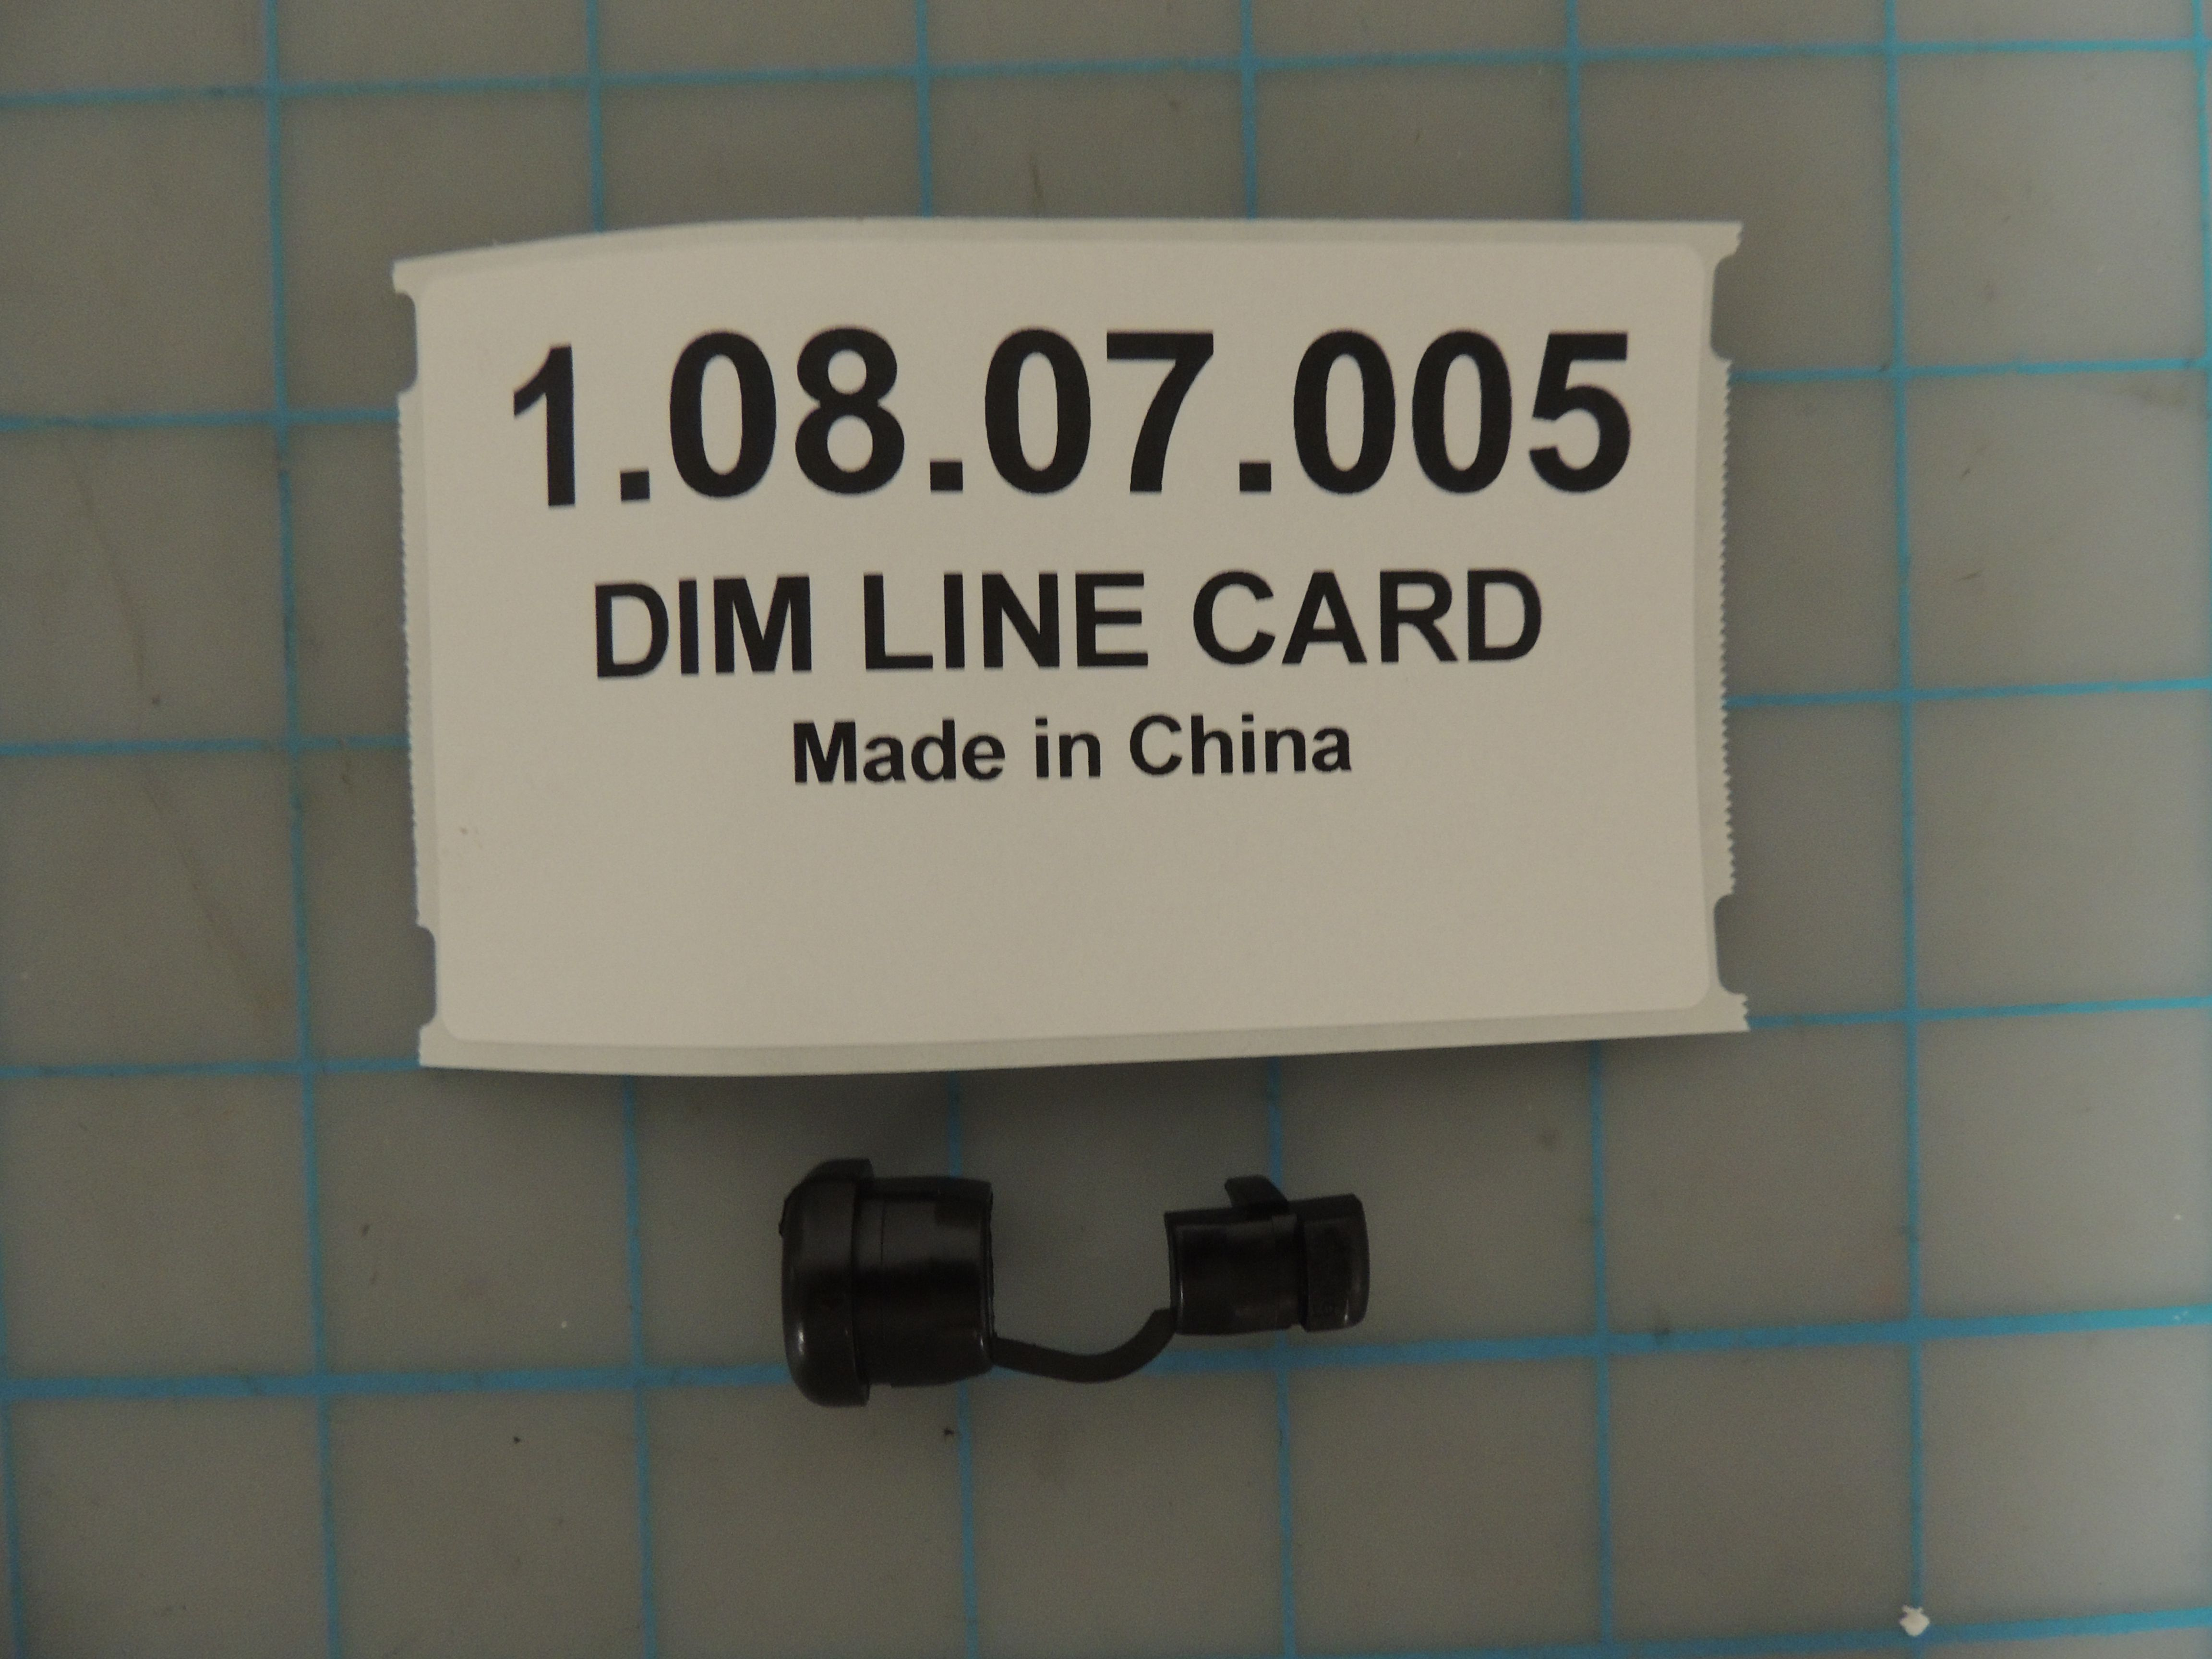 DIM LINE CARD